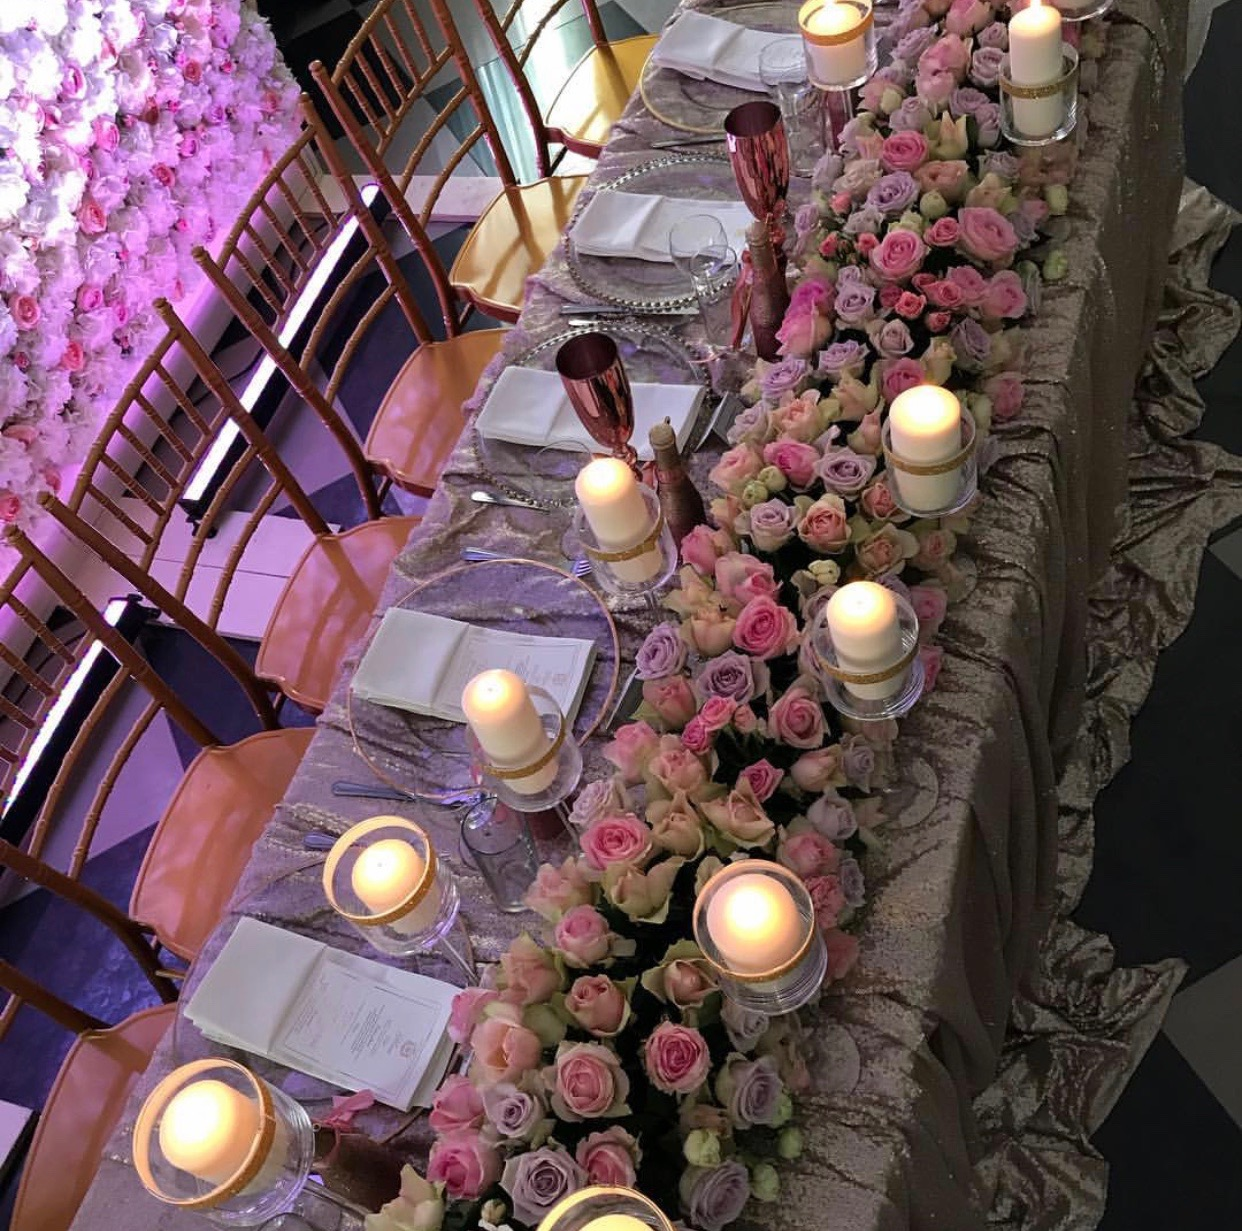 dekoracija vencanja cvecem u pastelnim bojama